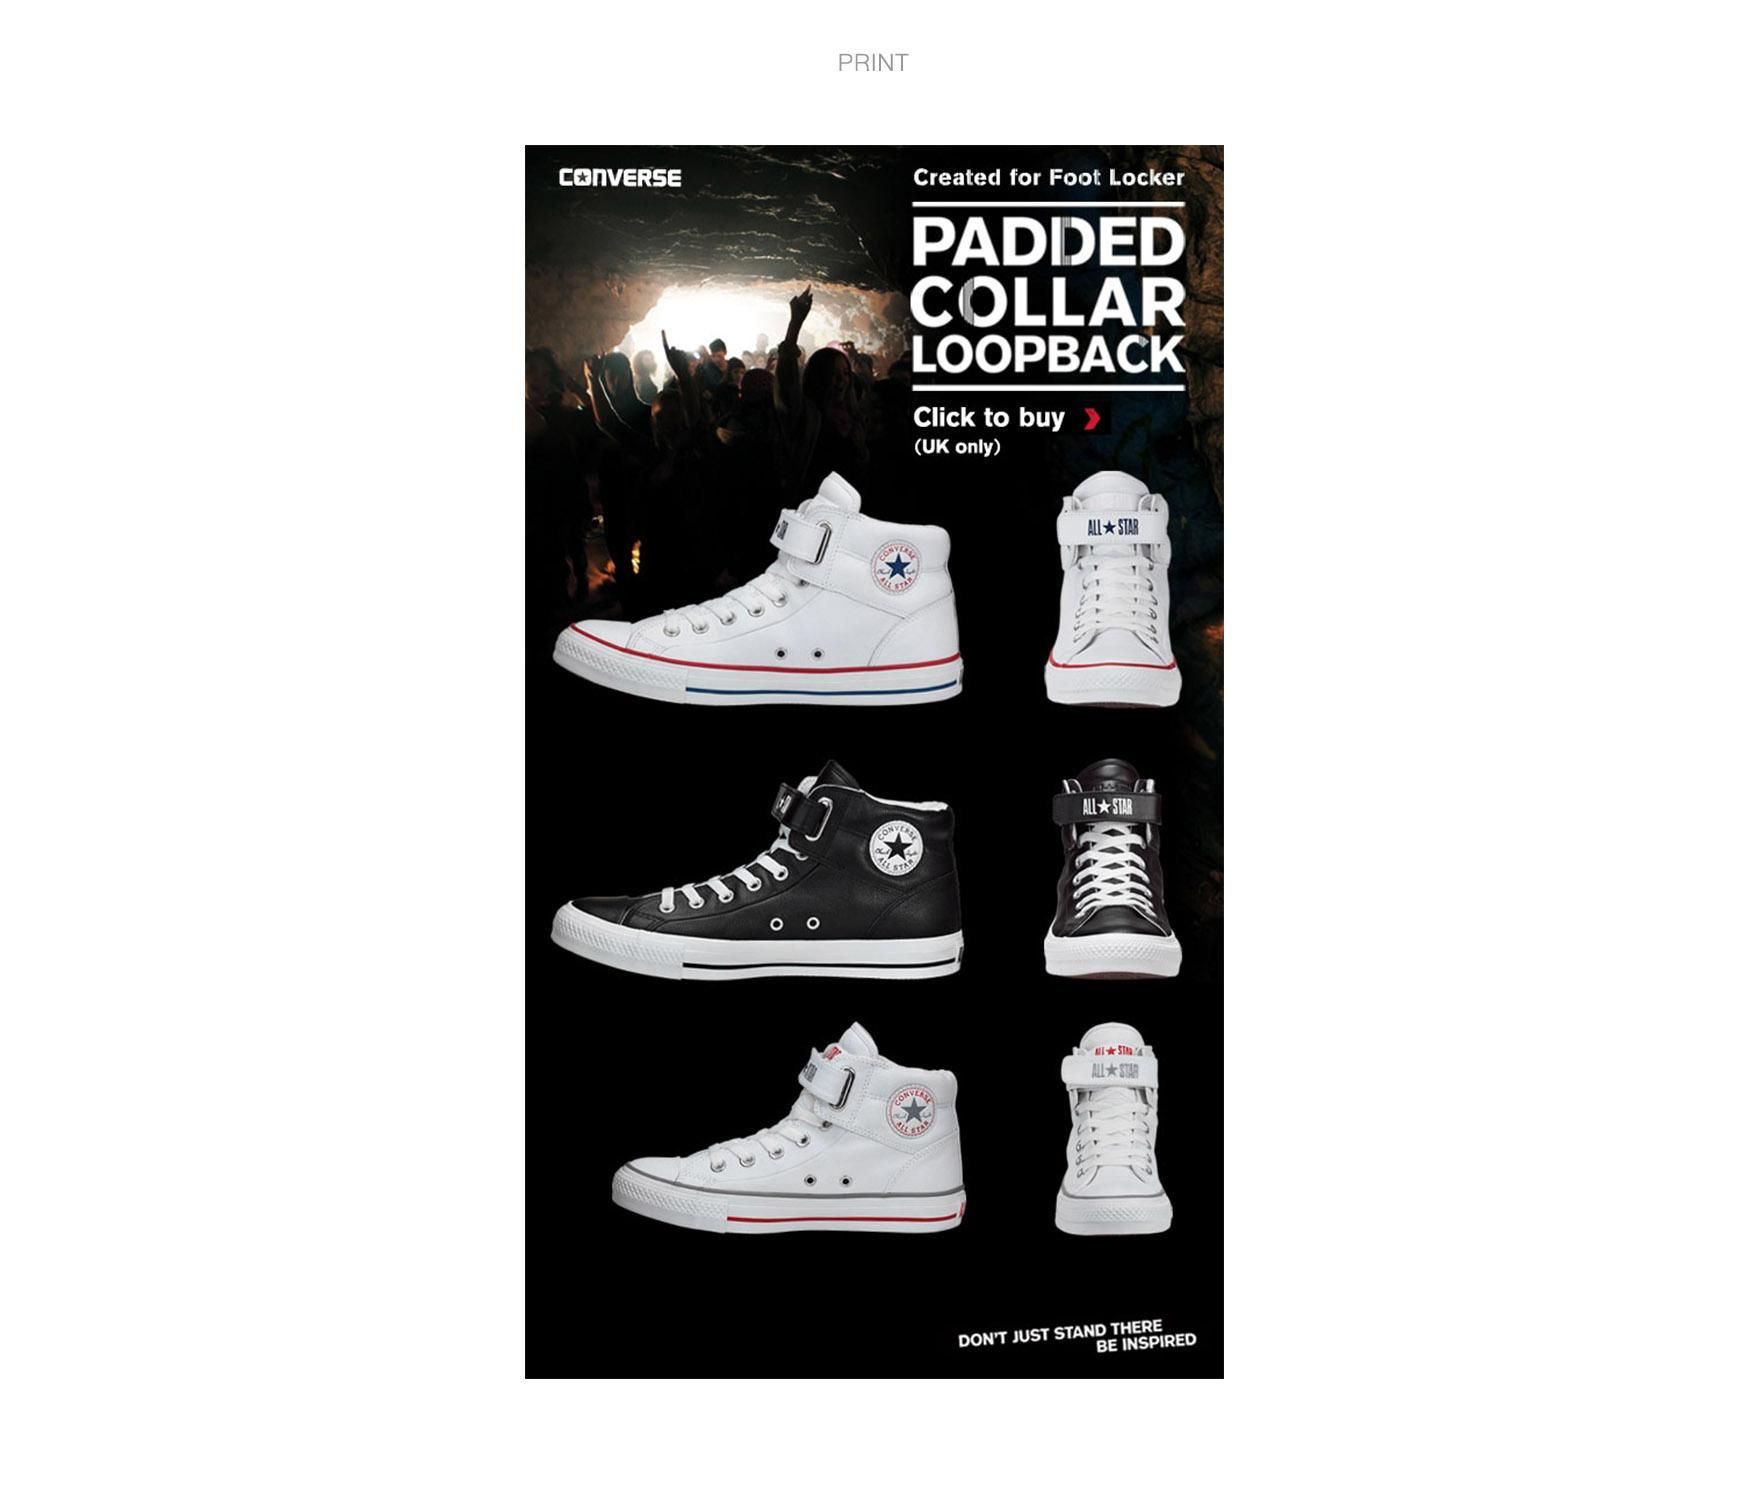 82e7f3a160a0 Foot Locker Converse – Cataphiles